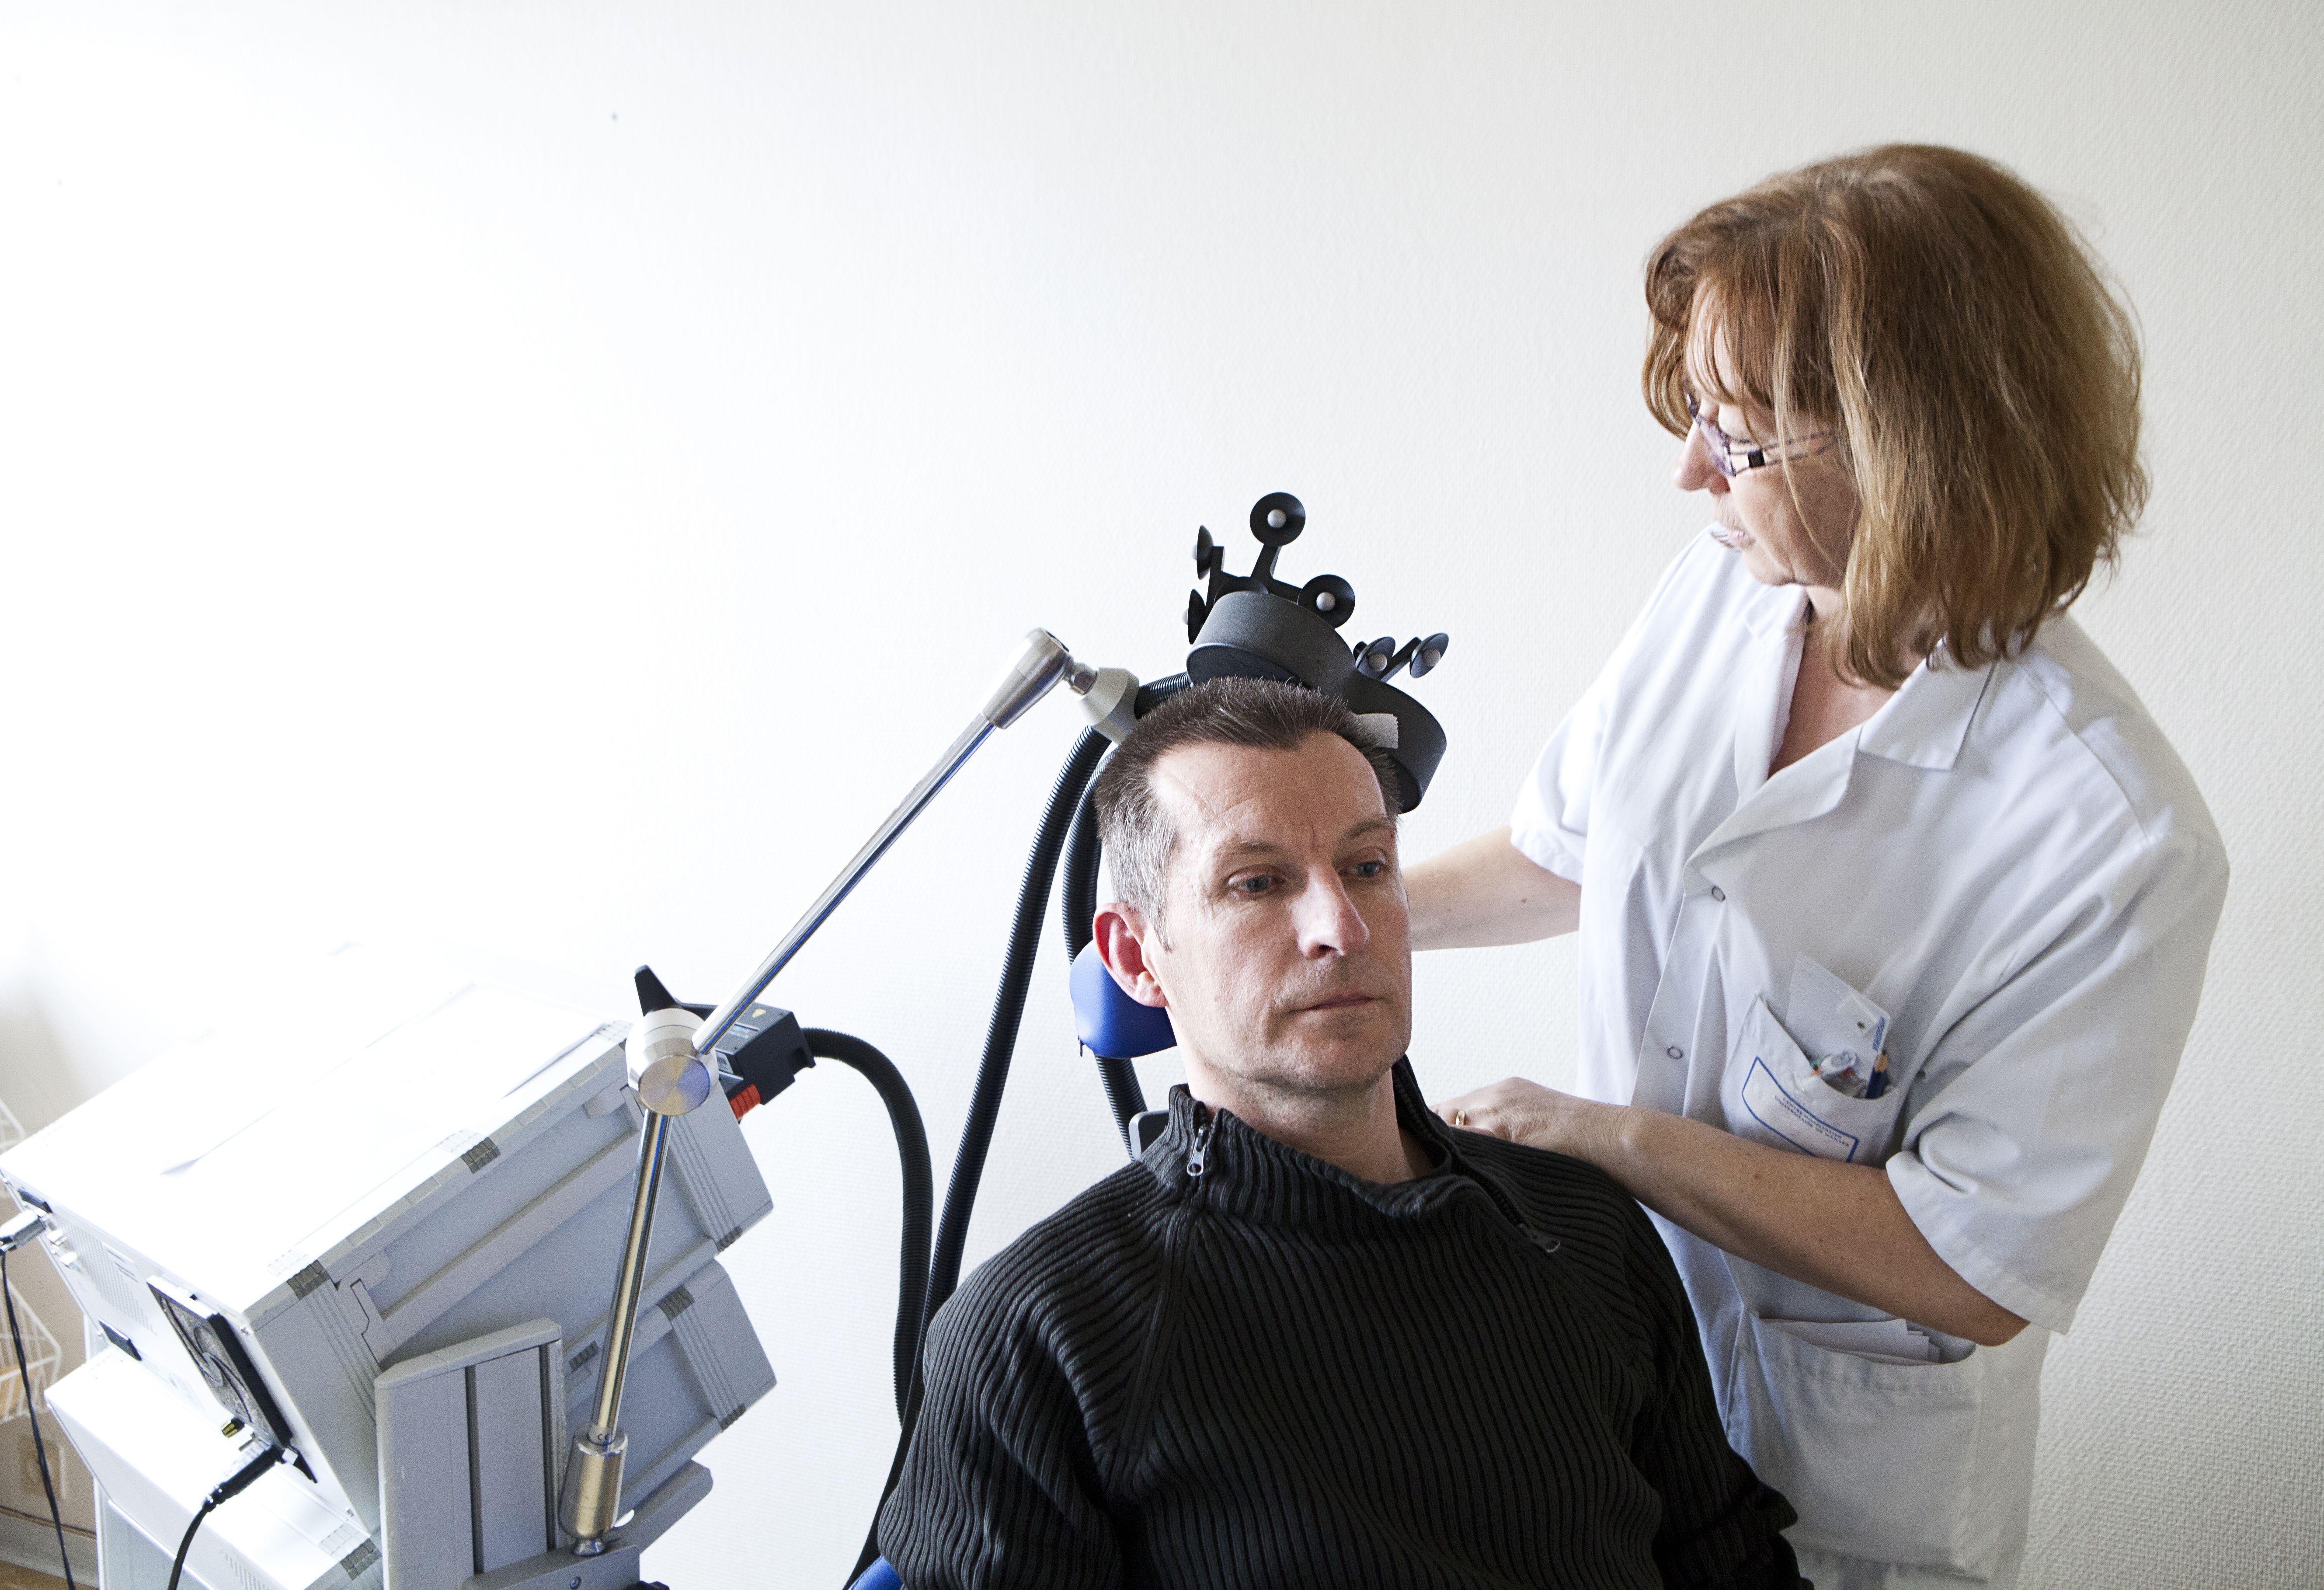 Repetitive Transcranial Magnetic Stimulation